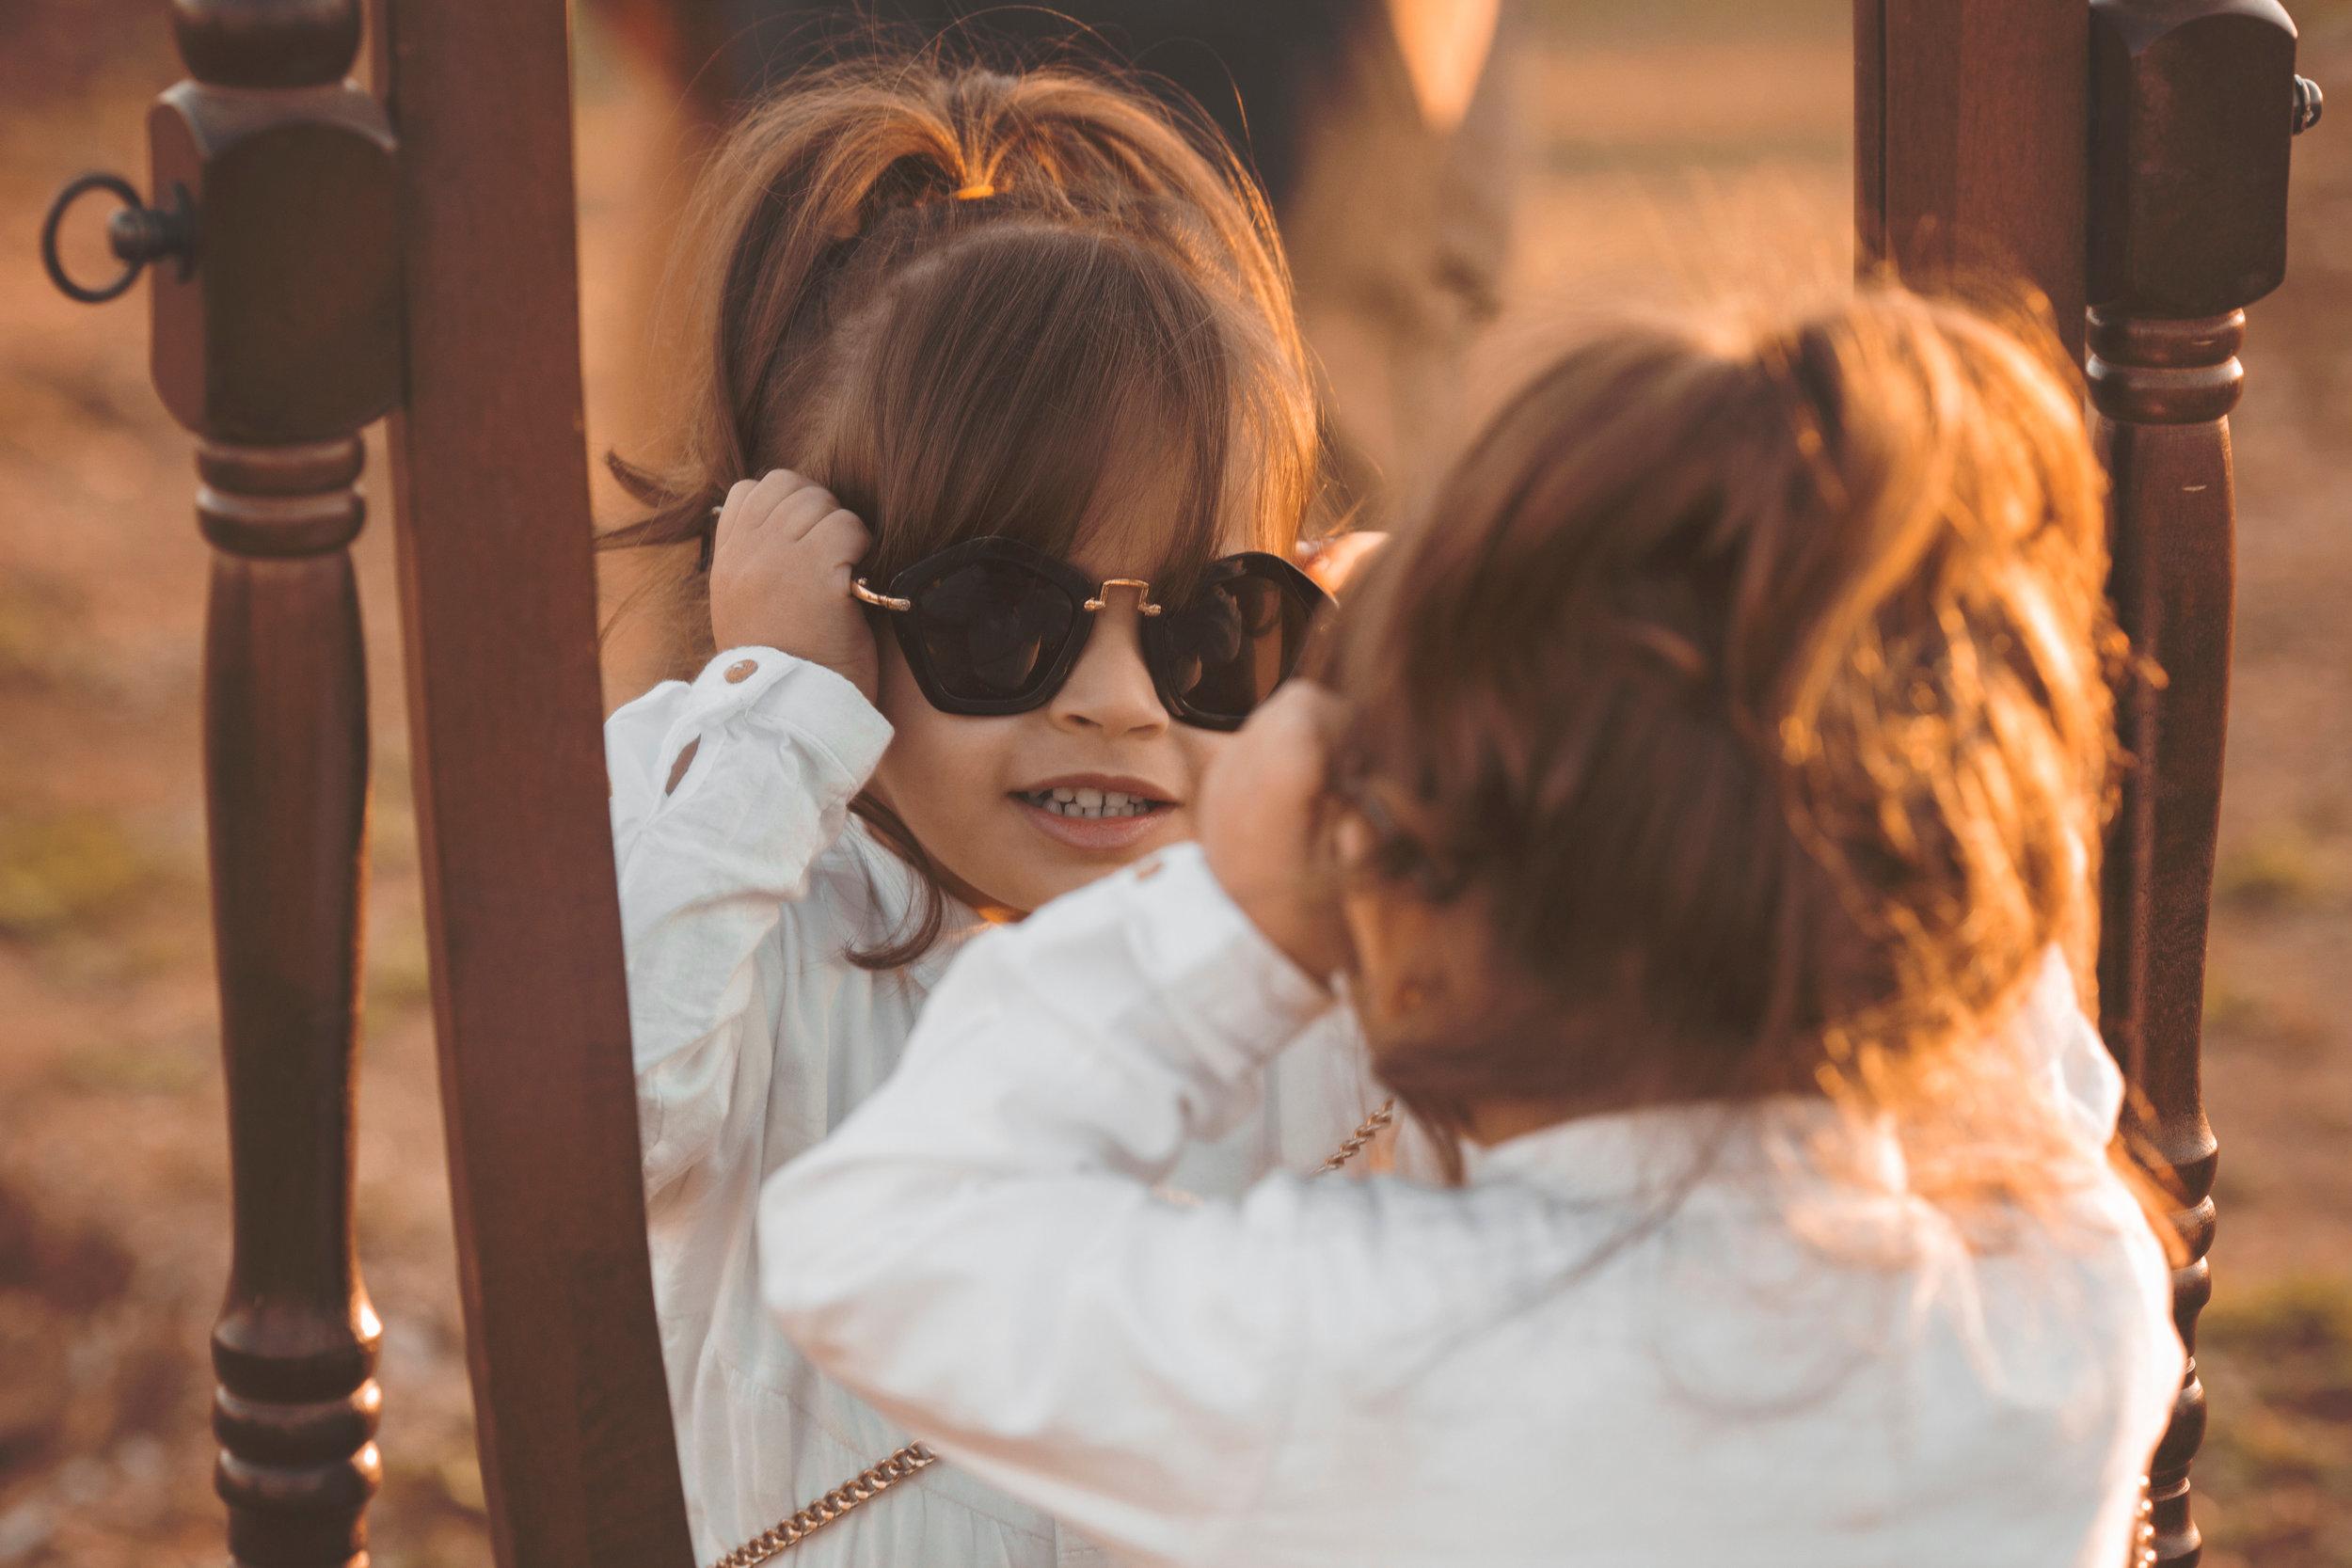 Canva - Girl in White Long-sleeved Shirt Wearing Sunglasses Facing Mirror.jpg